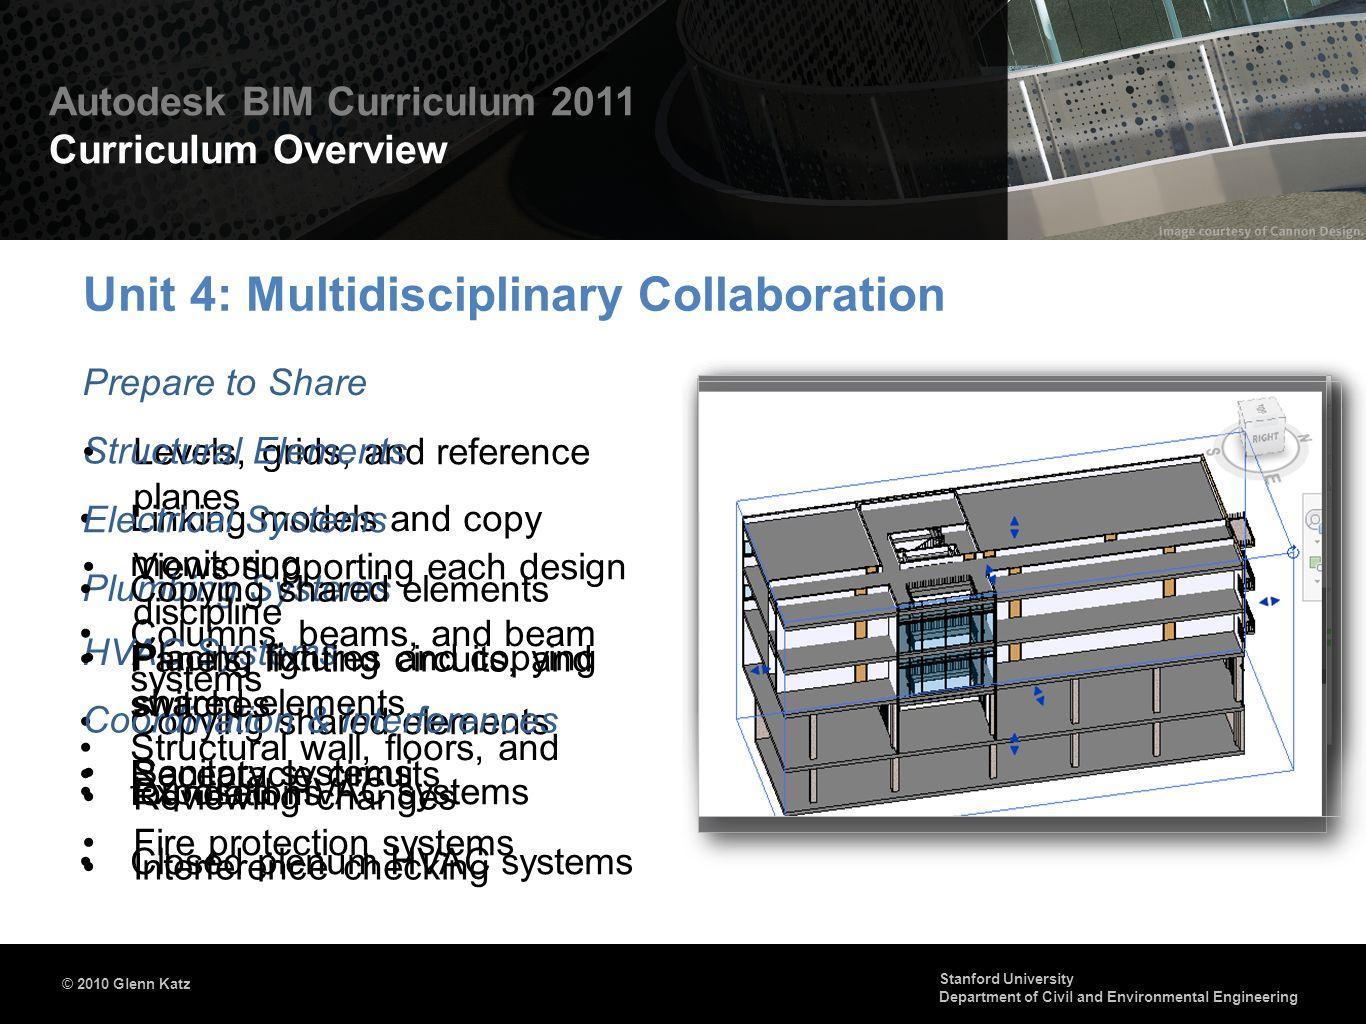 Unit 4: Multidisciplinary Collaboration